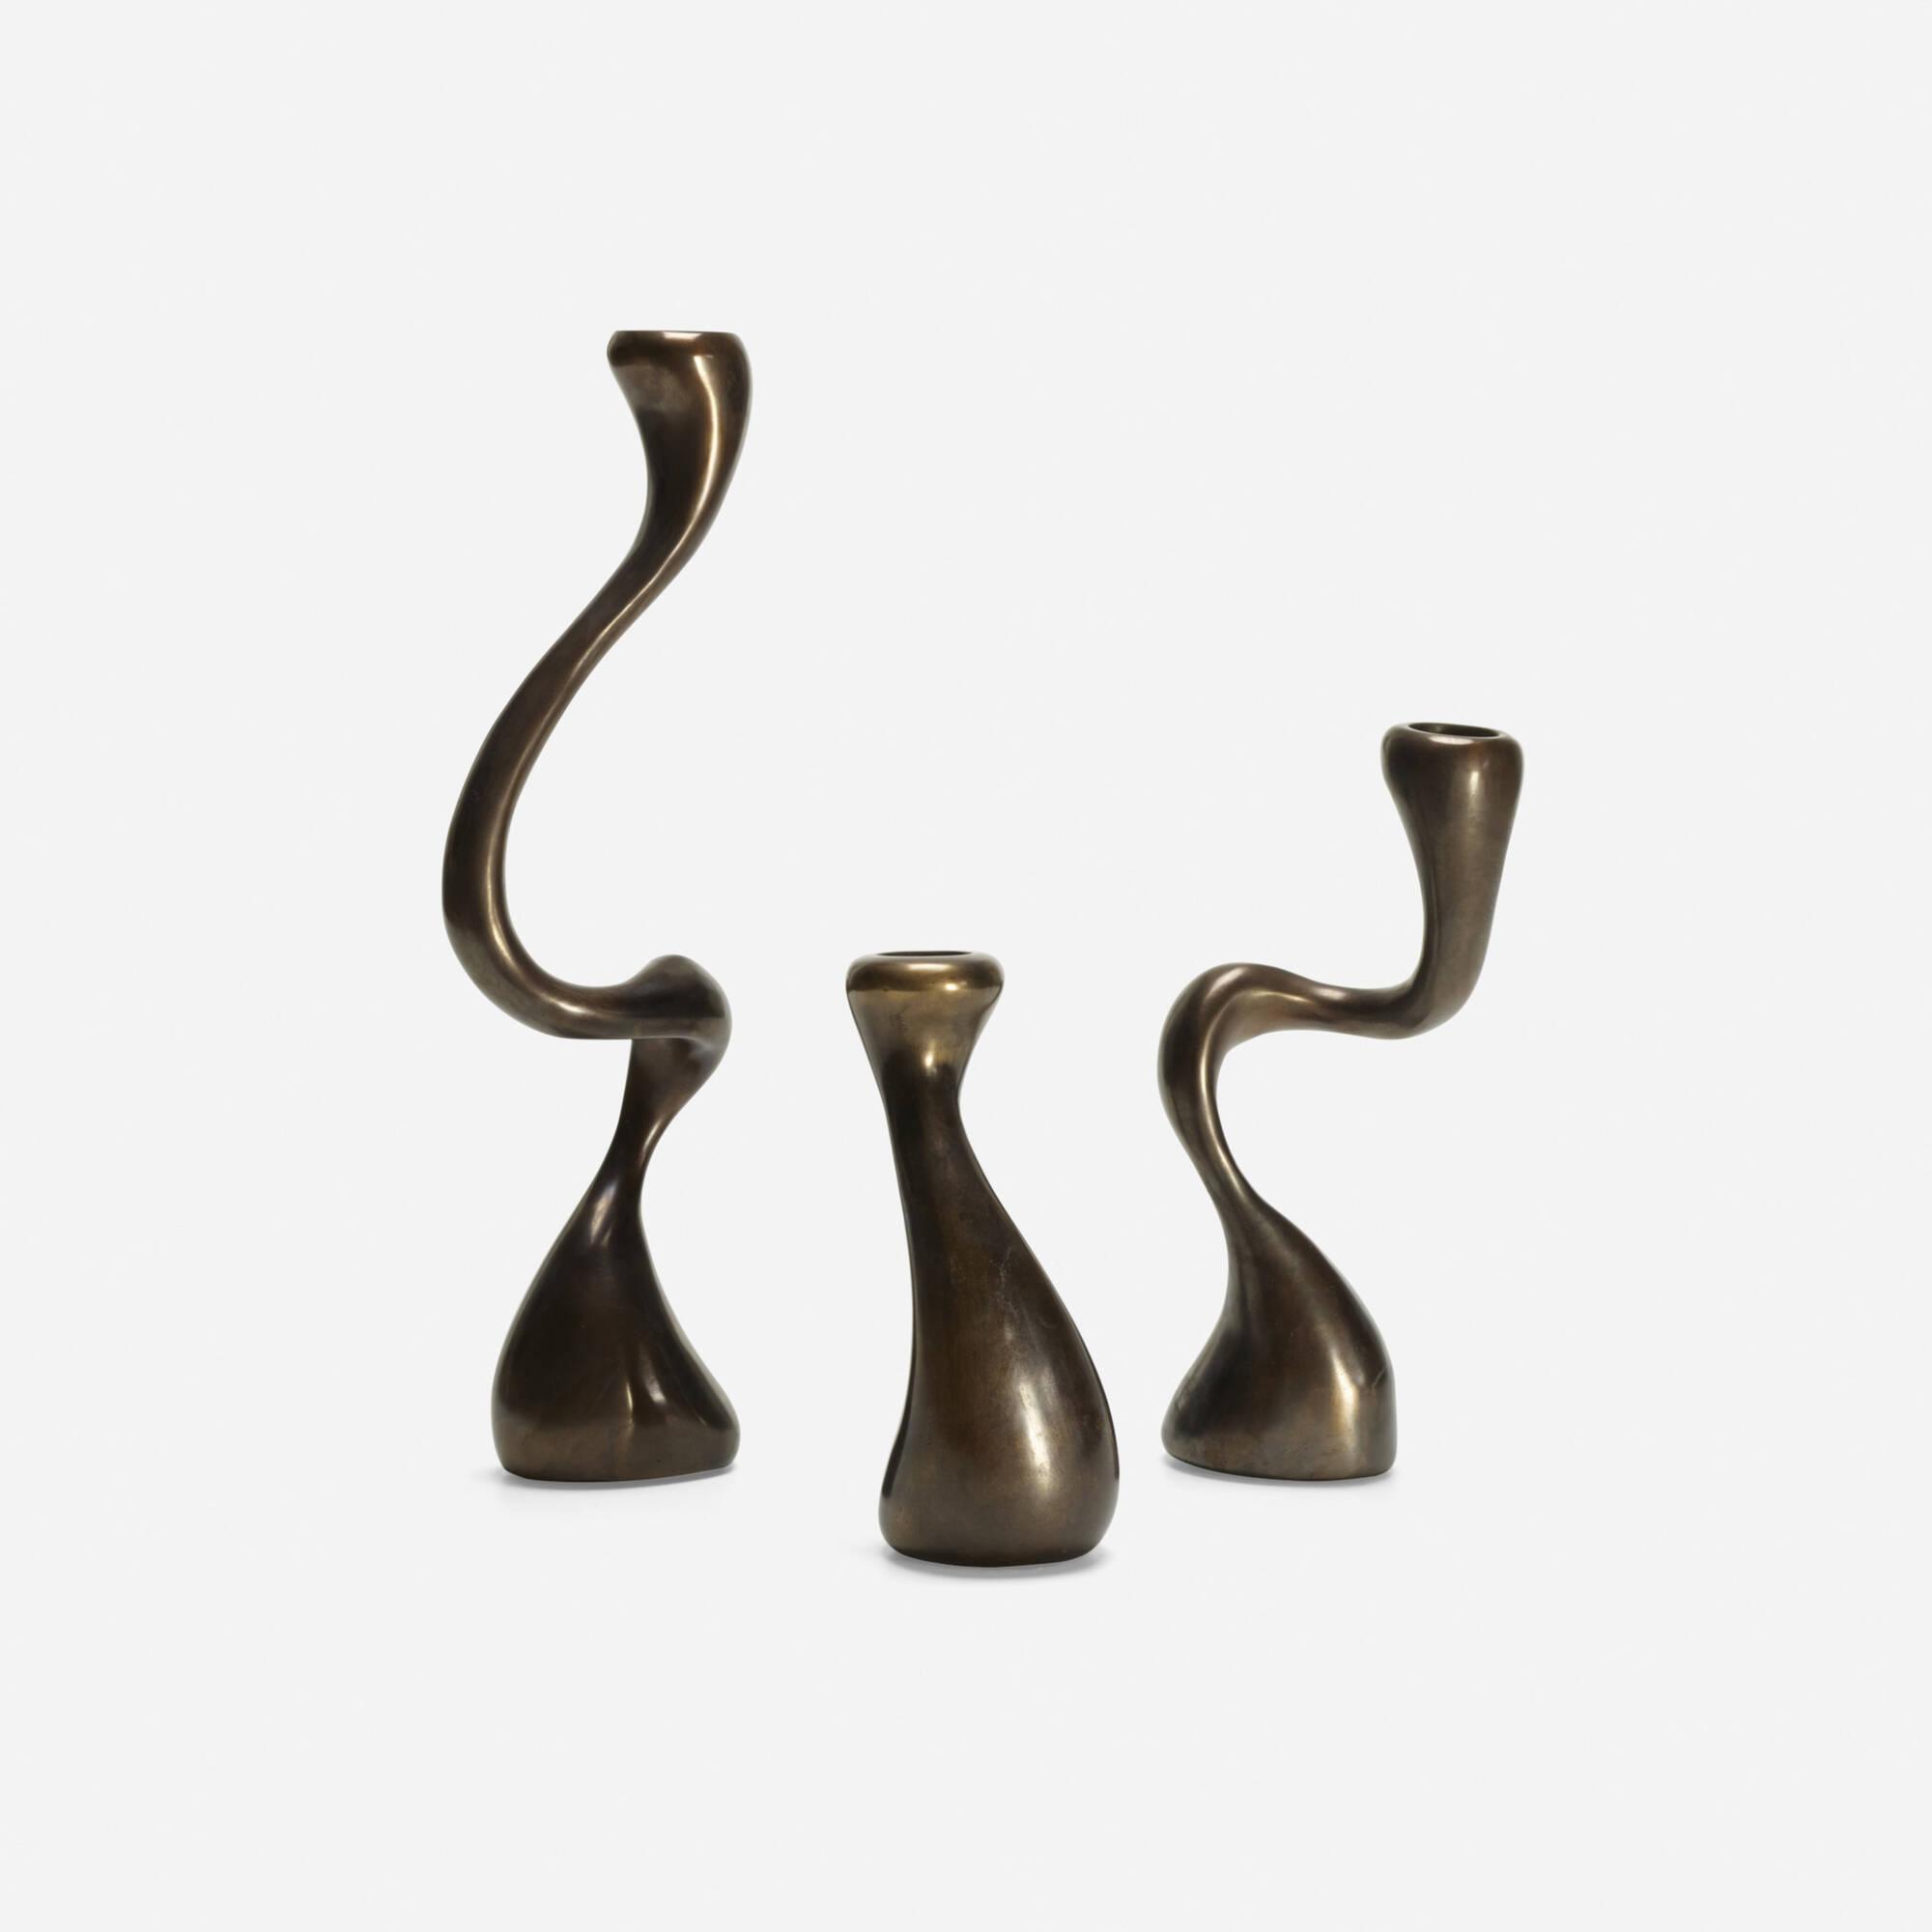 171: Jordan Mozer / Anna Mae candlesticks, set of three (1 of 1)